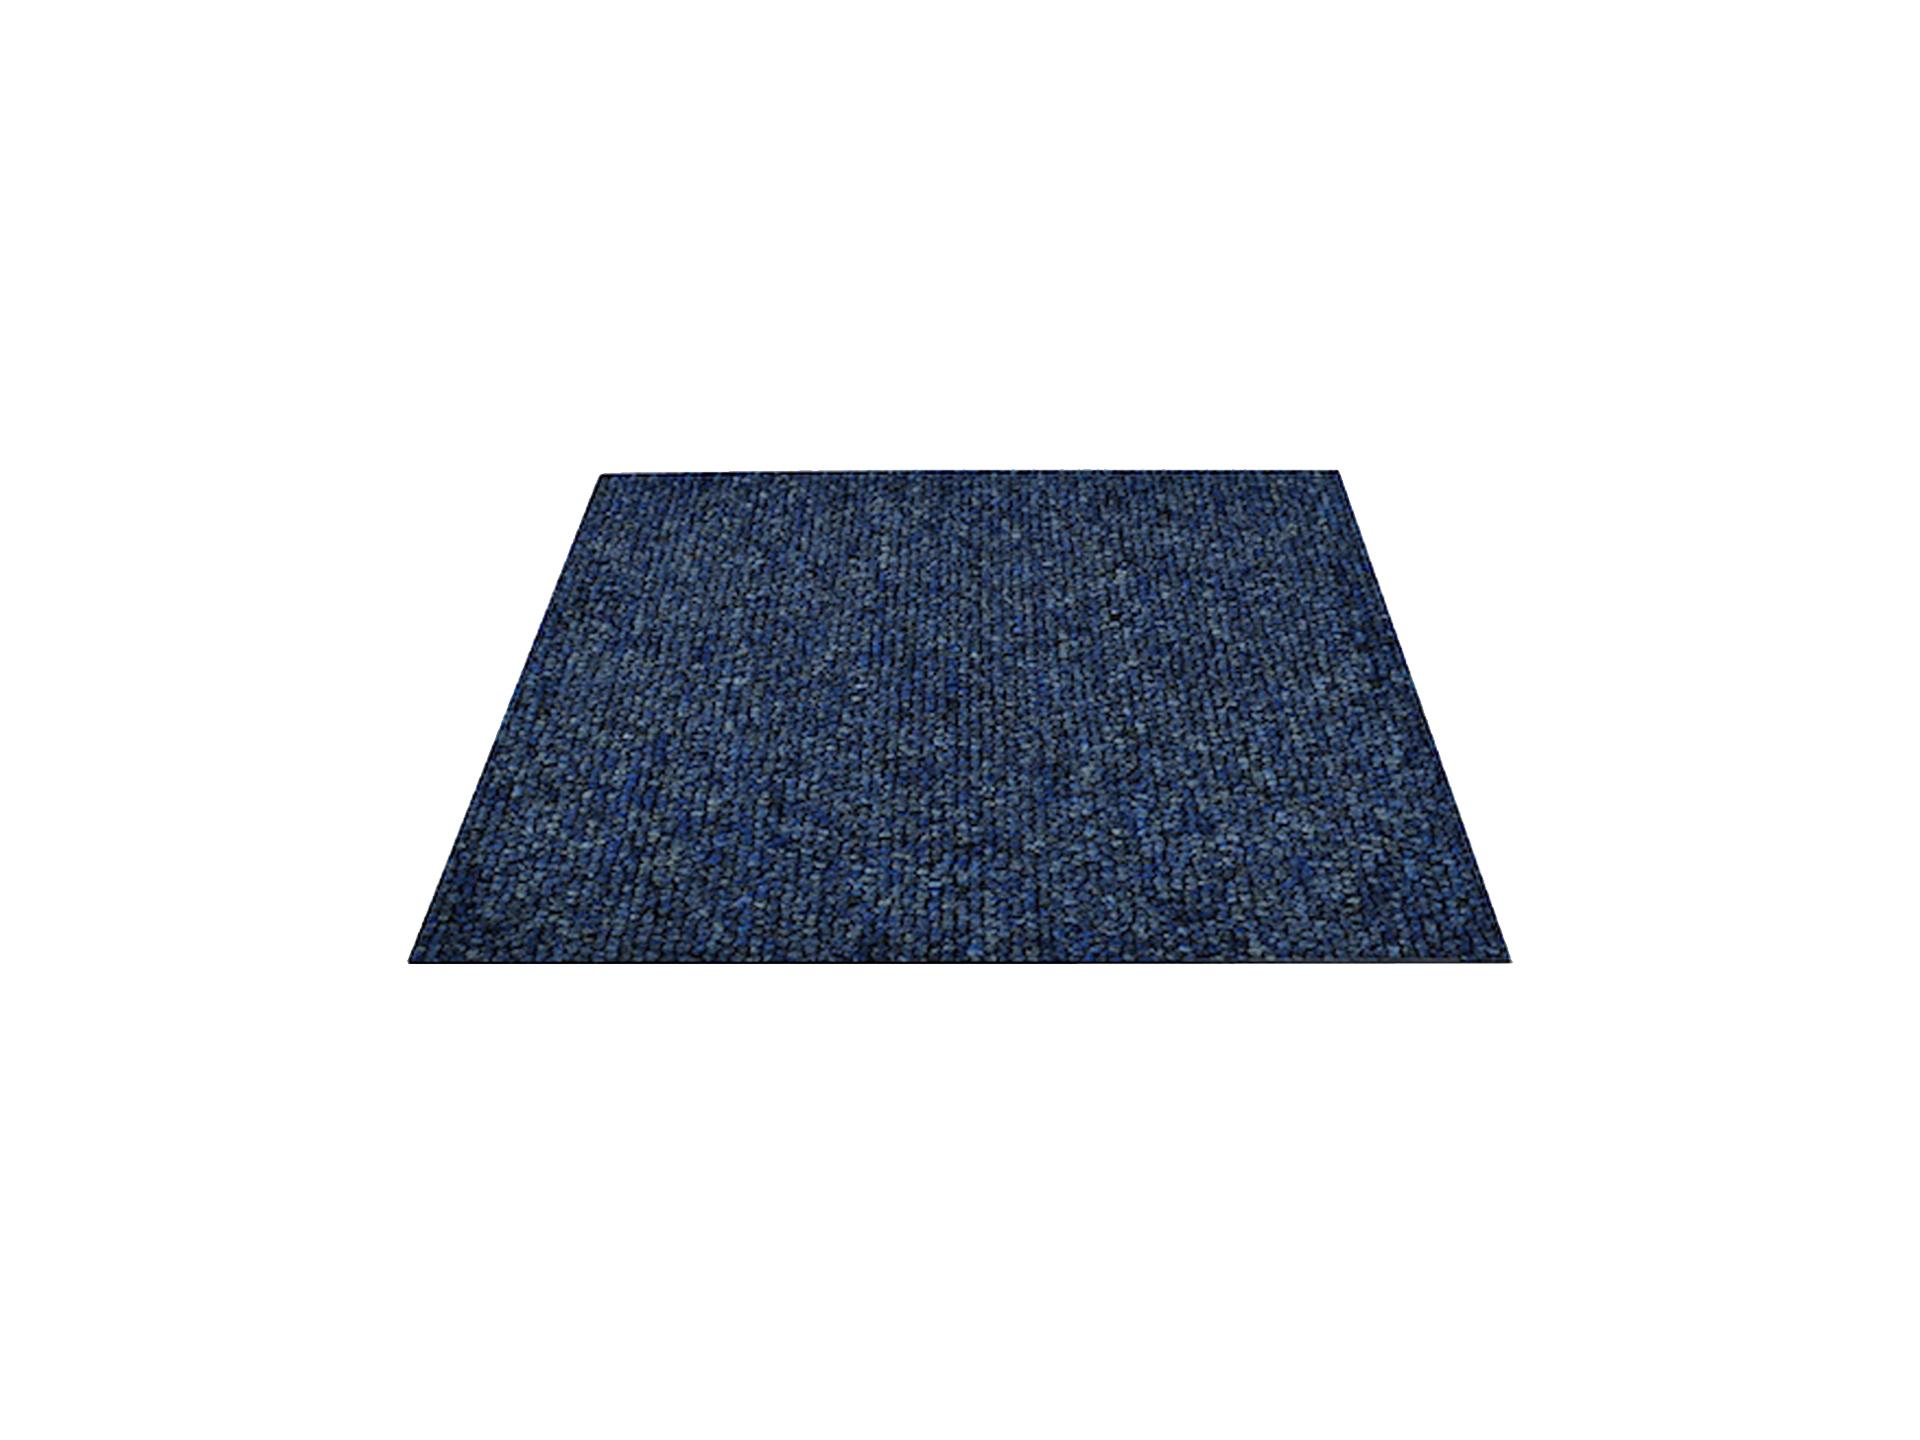 tapijttegel 50x 50 CM blauw